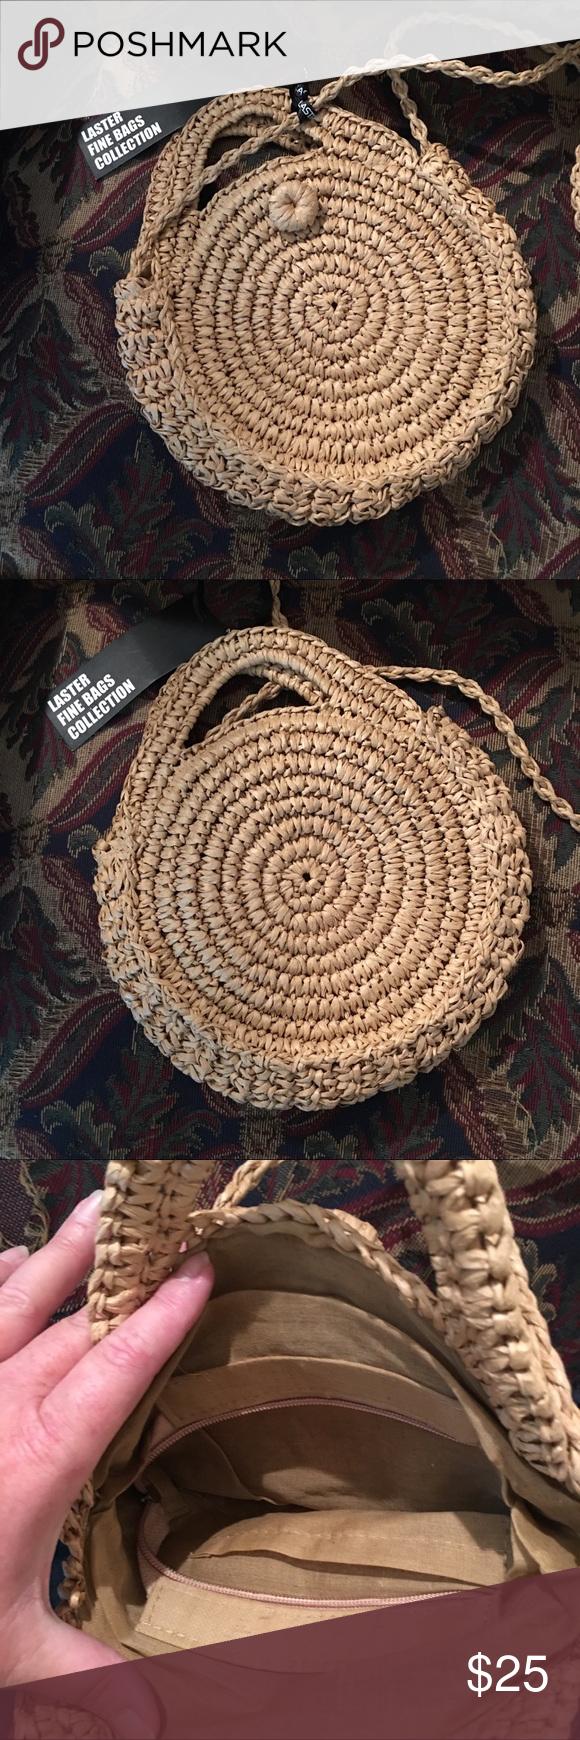 "ad551b2e72e0 Laster 12"" Round Straw shoulder bag ✨B2G1F✨ Laster 12"" round straw shoulder  bag crossbody"